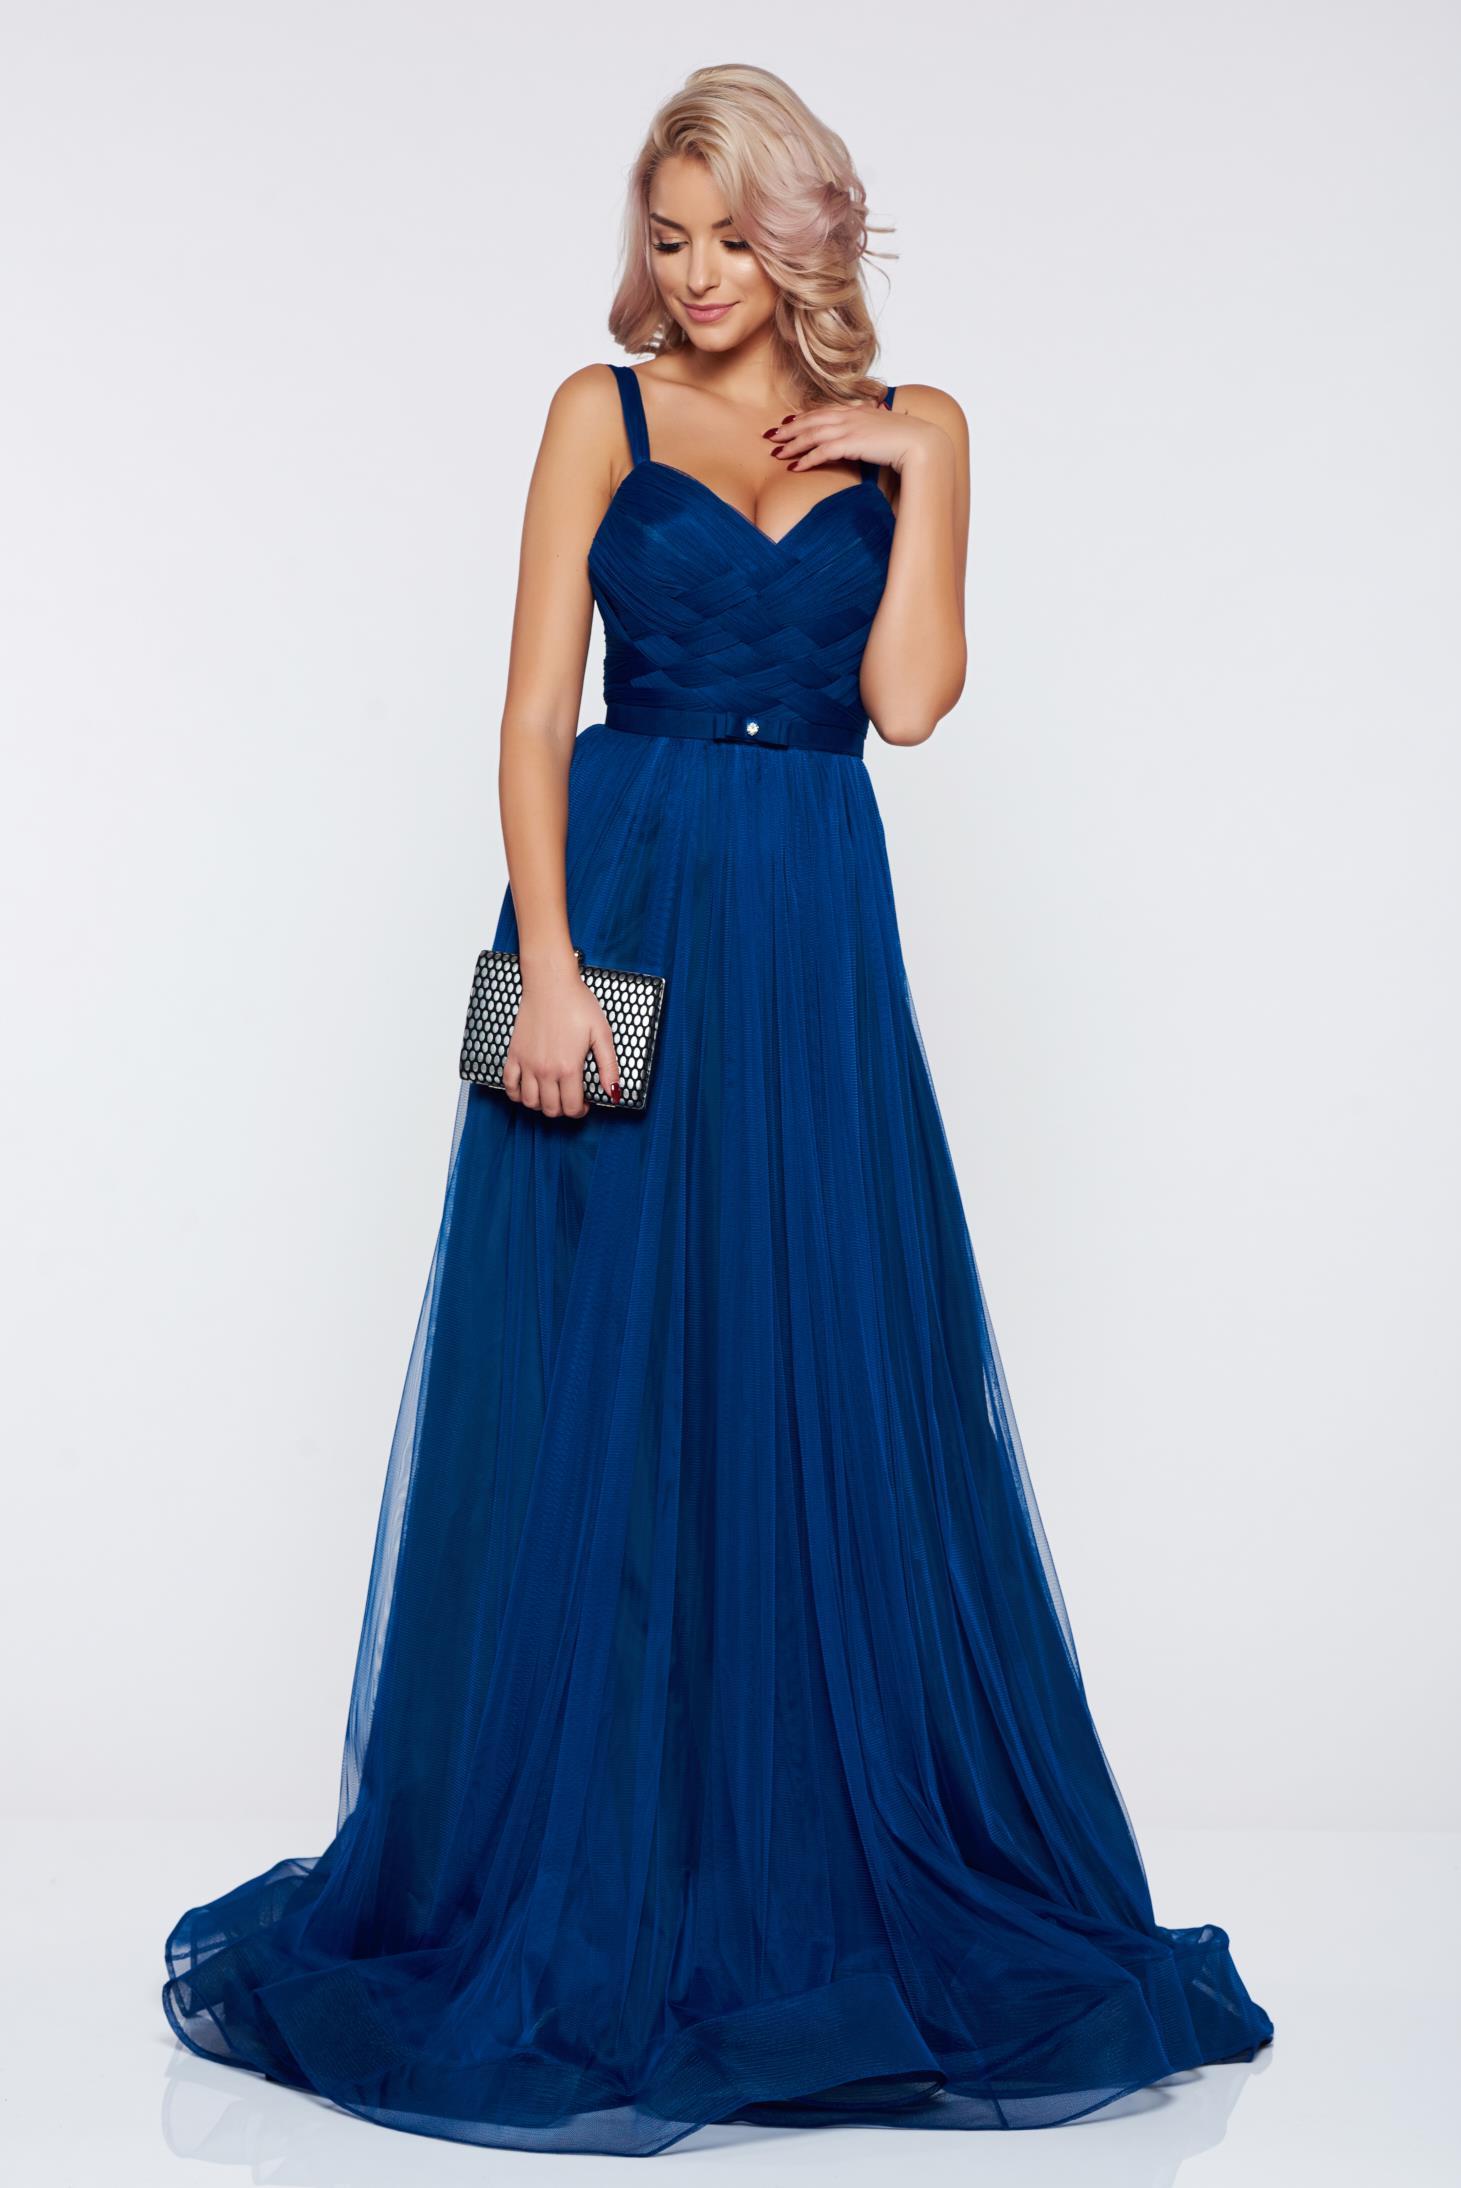 Rochie Ana Radu albastra de lux tip corset din tul captusita pe interior